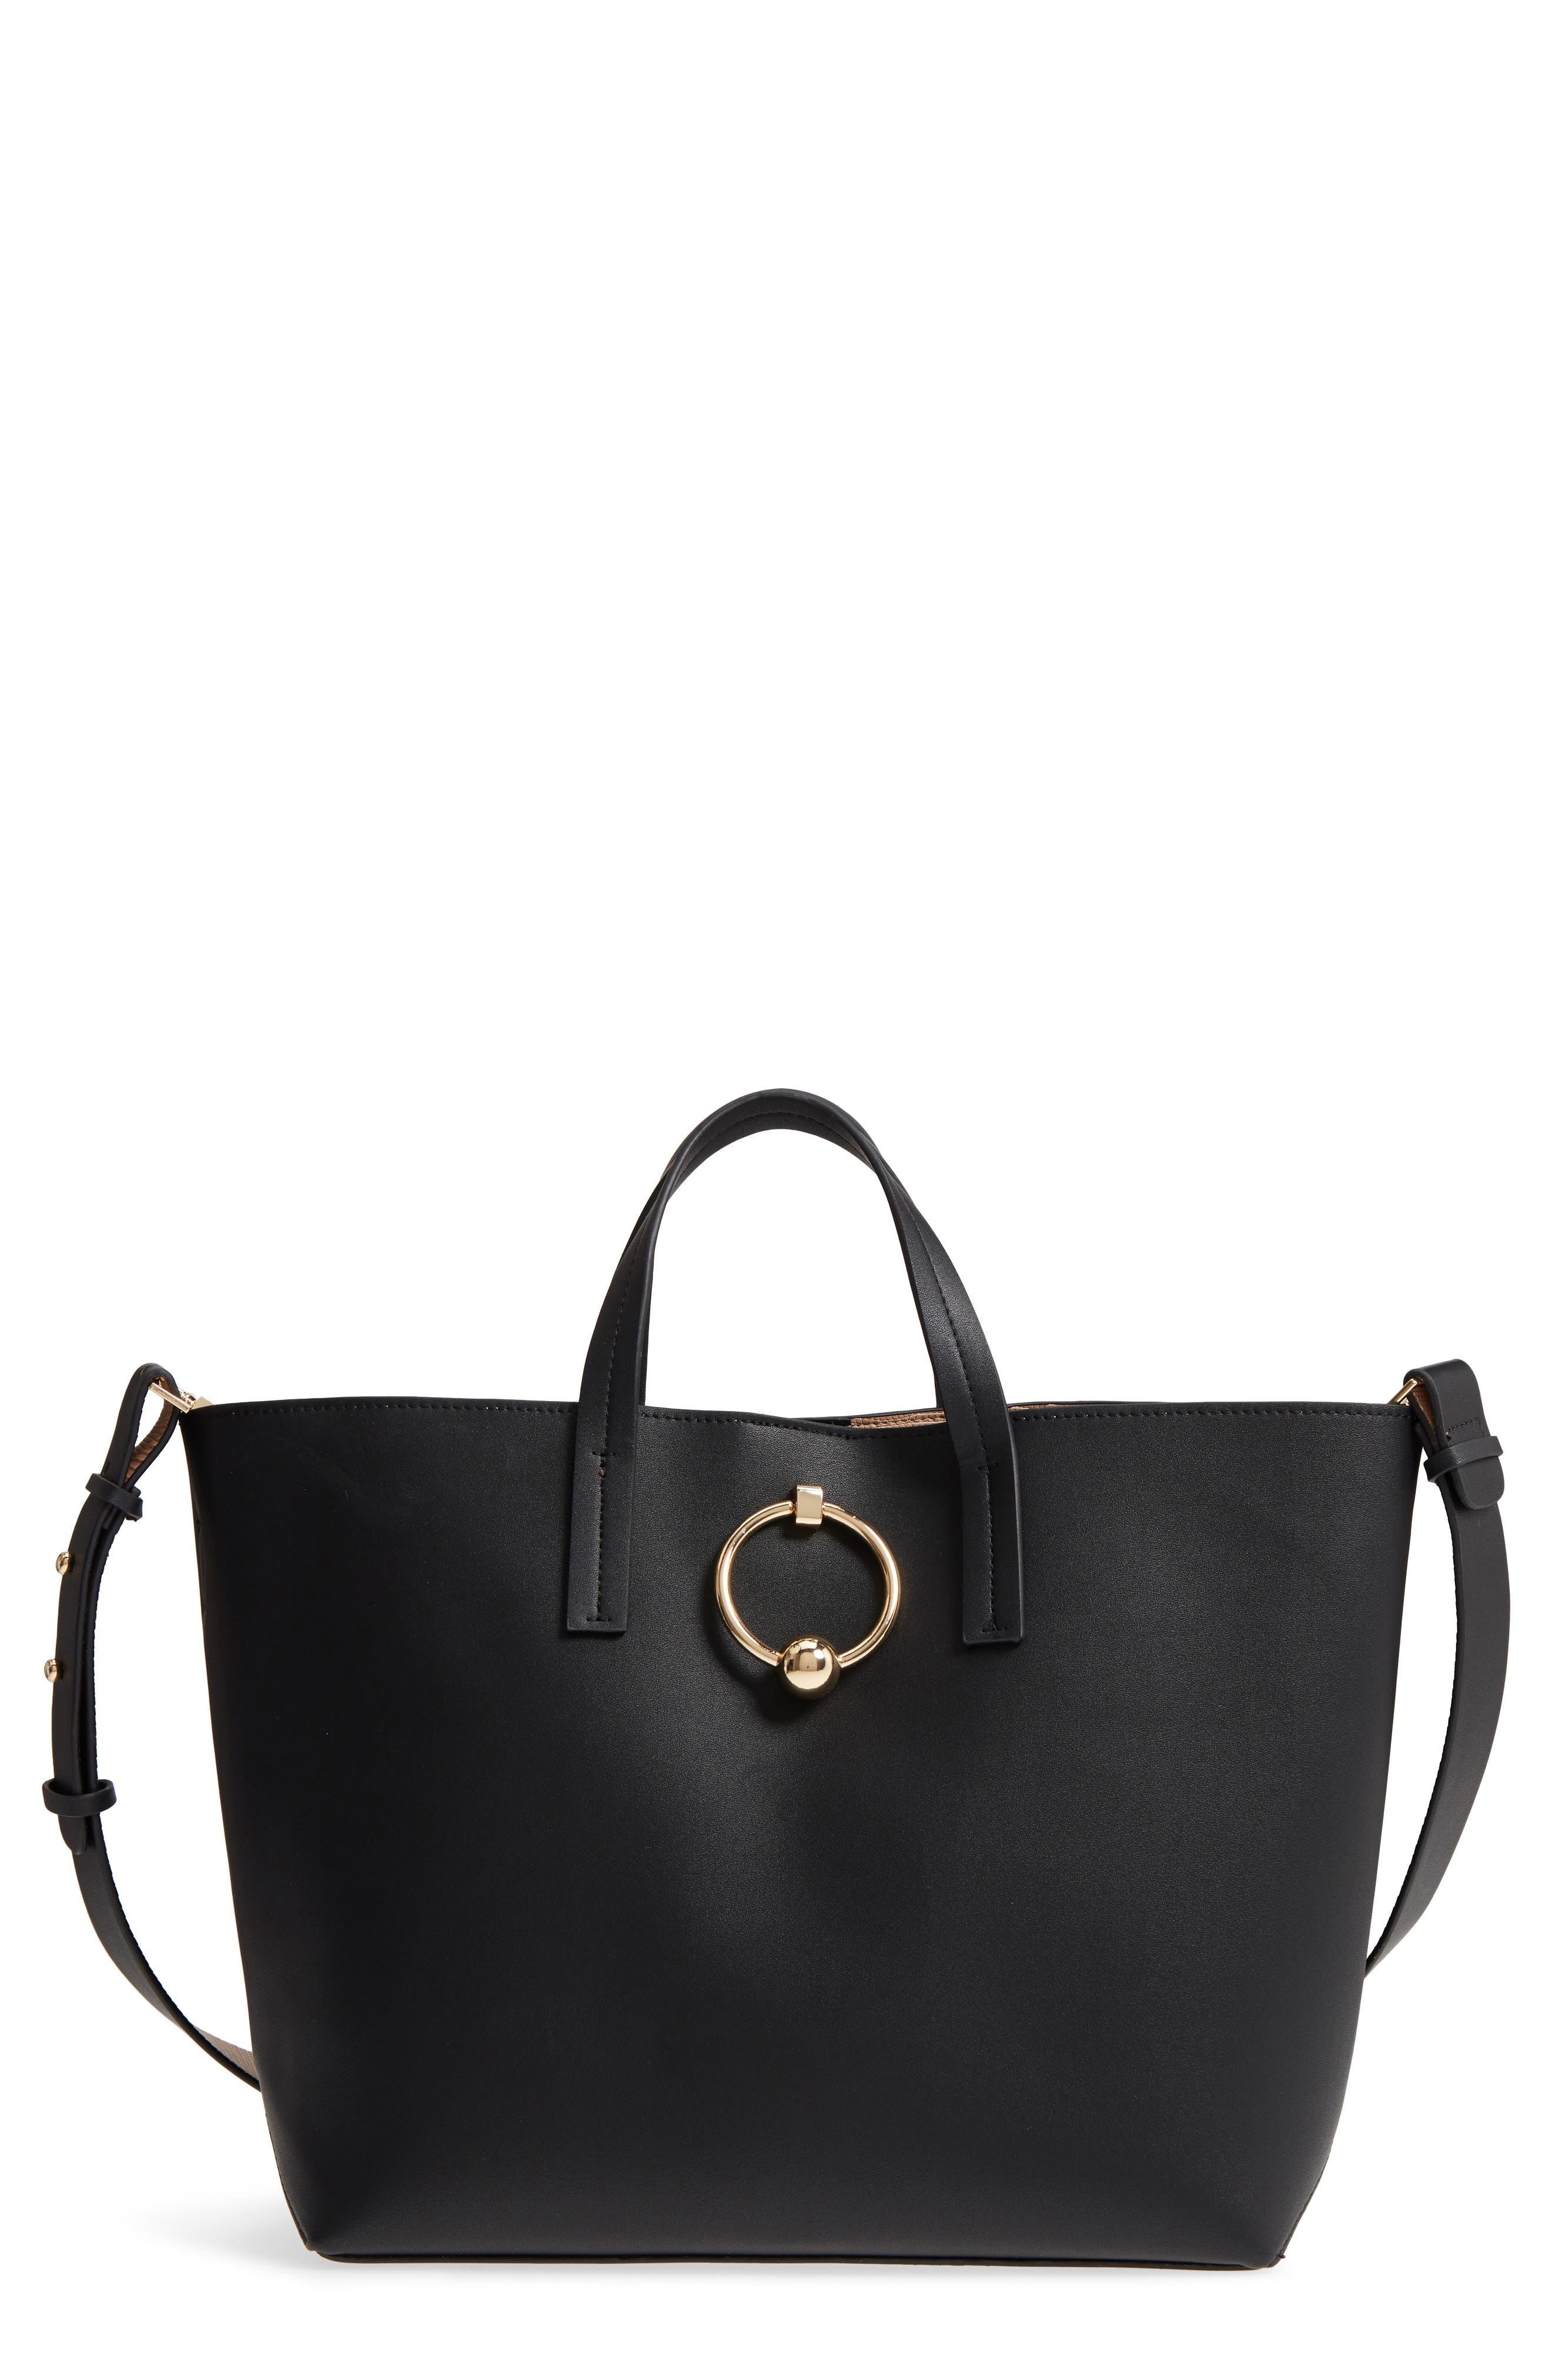 Seline Tote Bag,                         Main,                         color, Black